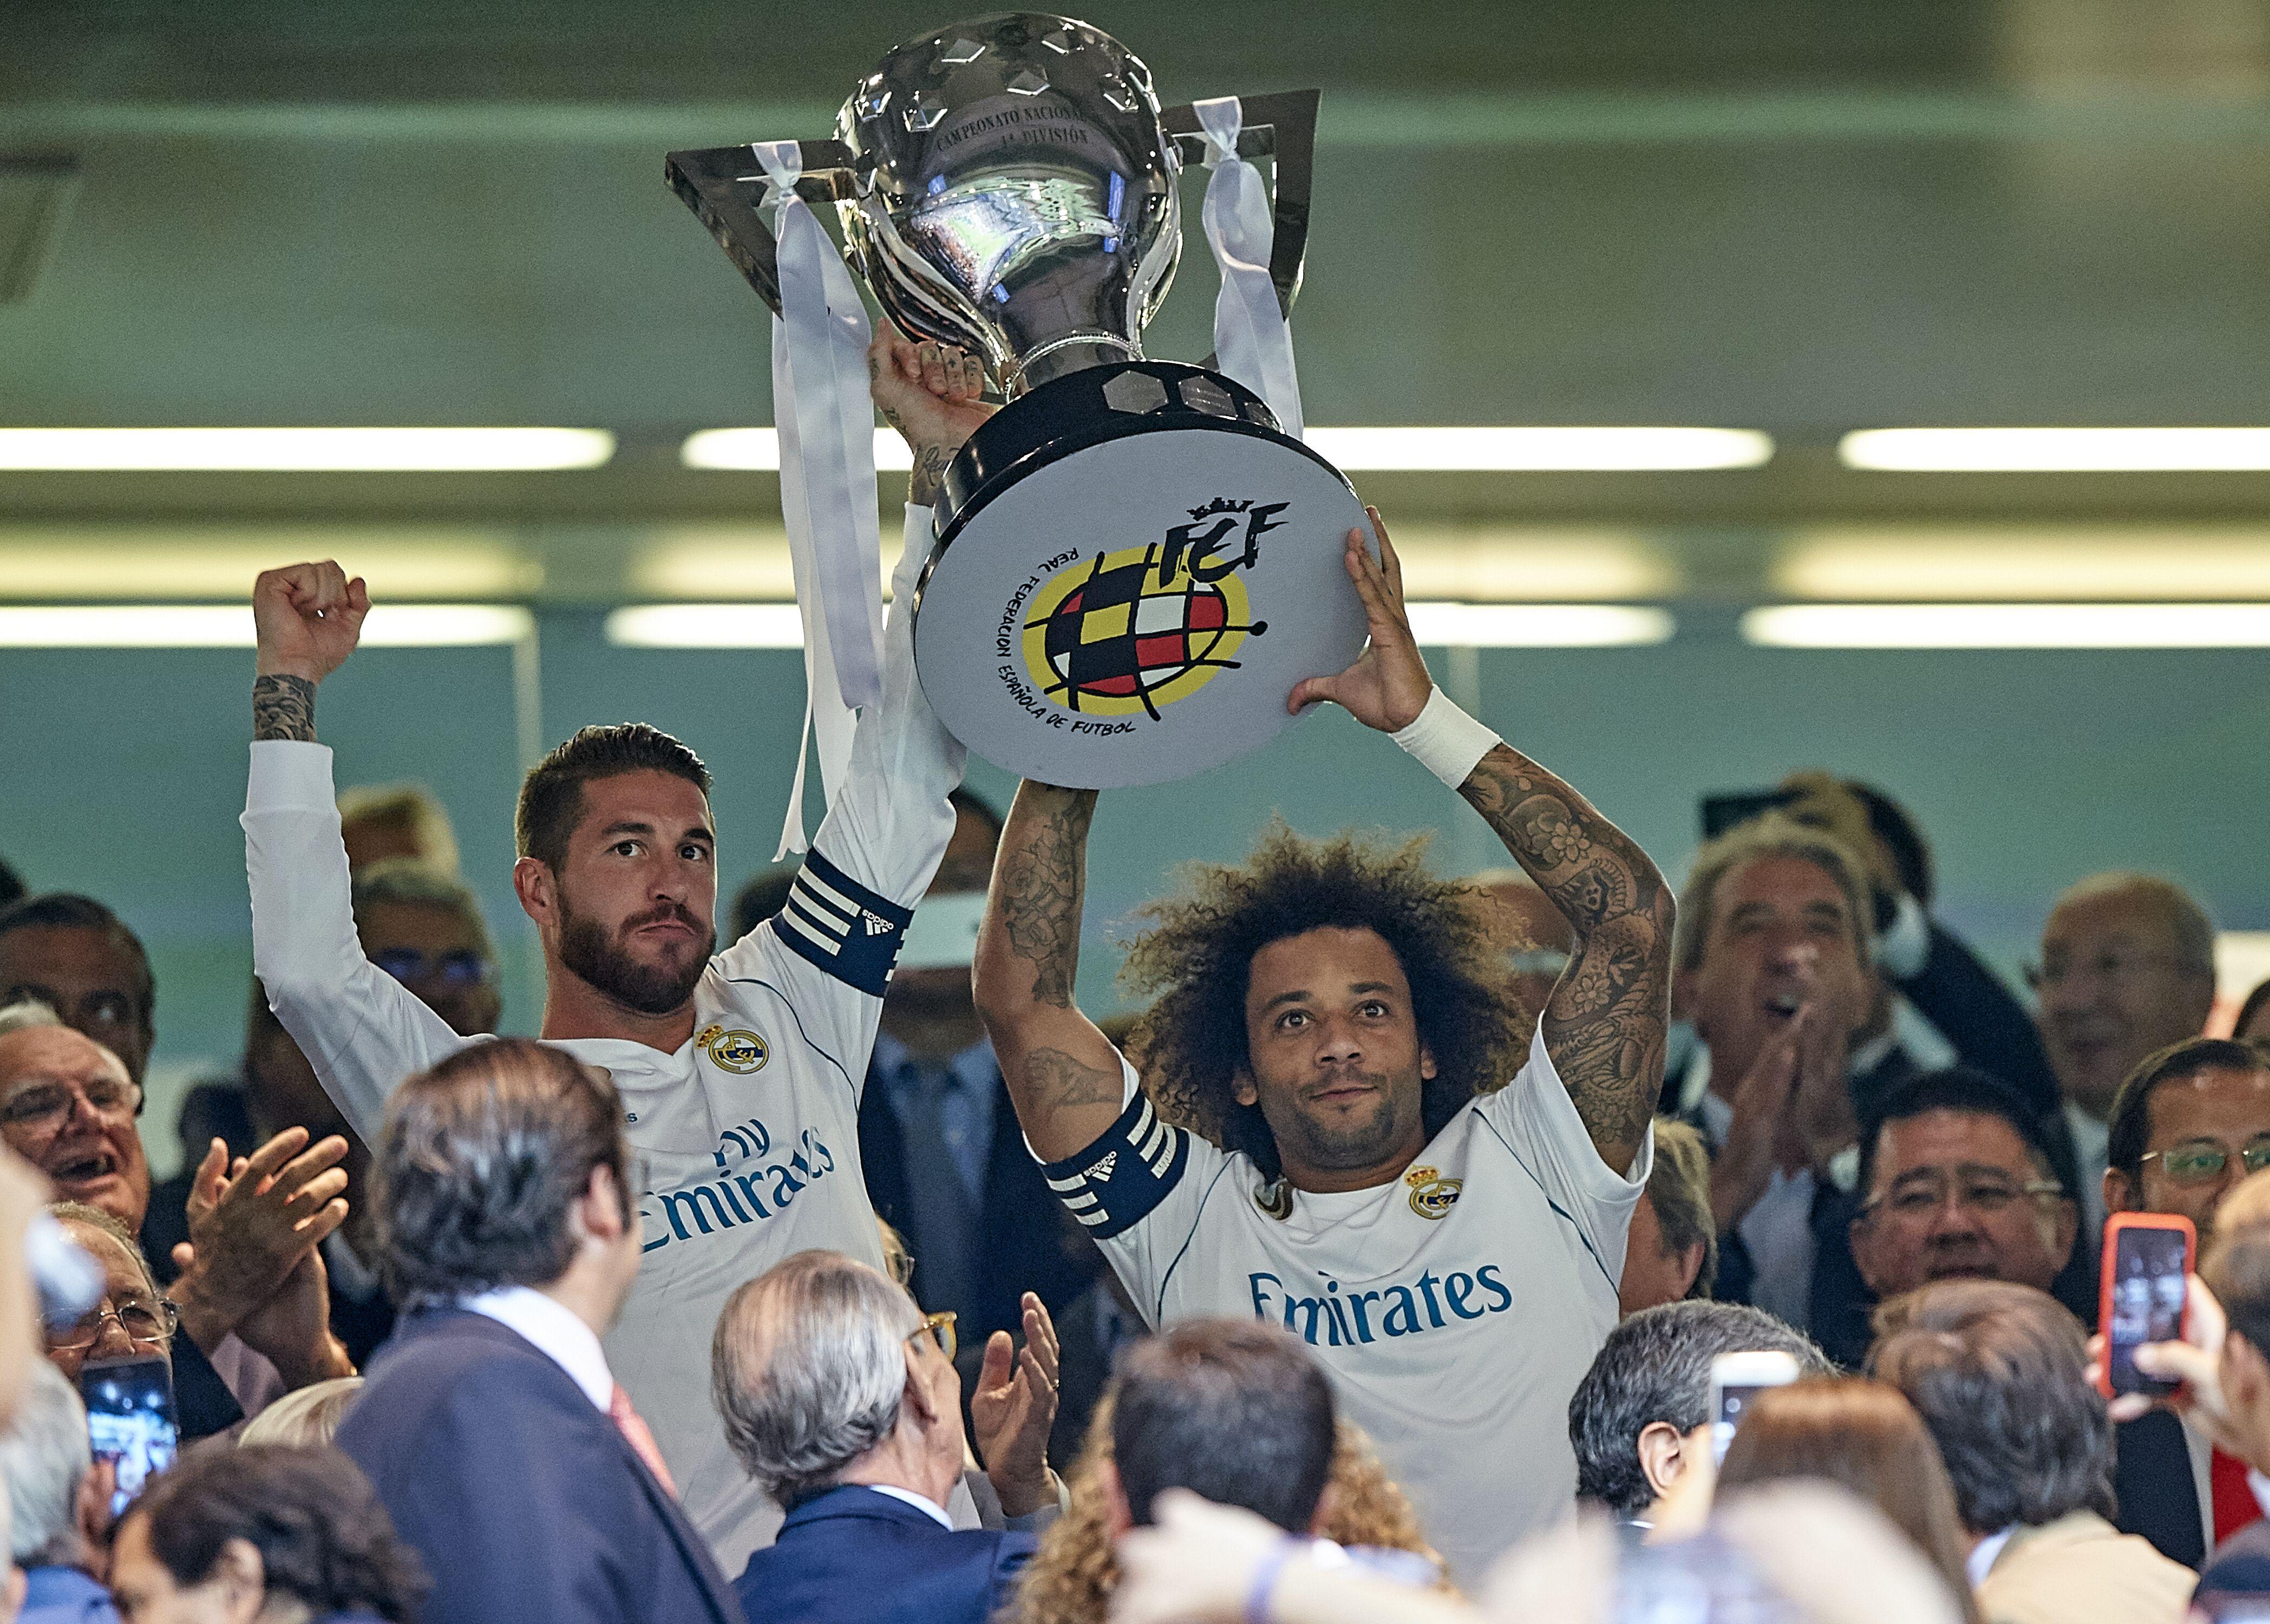 La Liga: 4 Reasons Real Madrid Historically Struggle To Win La Liga